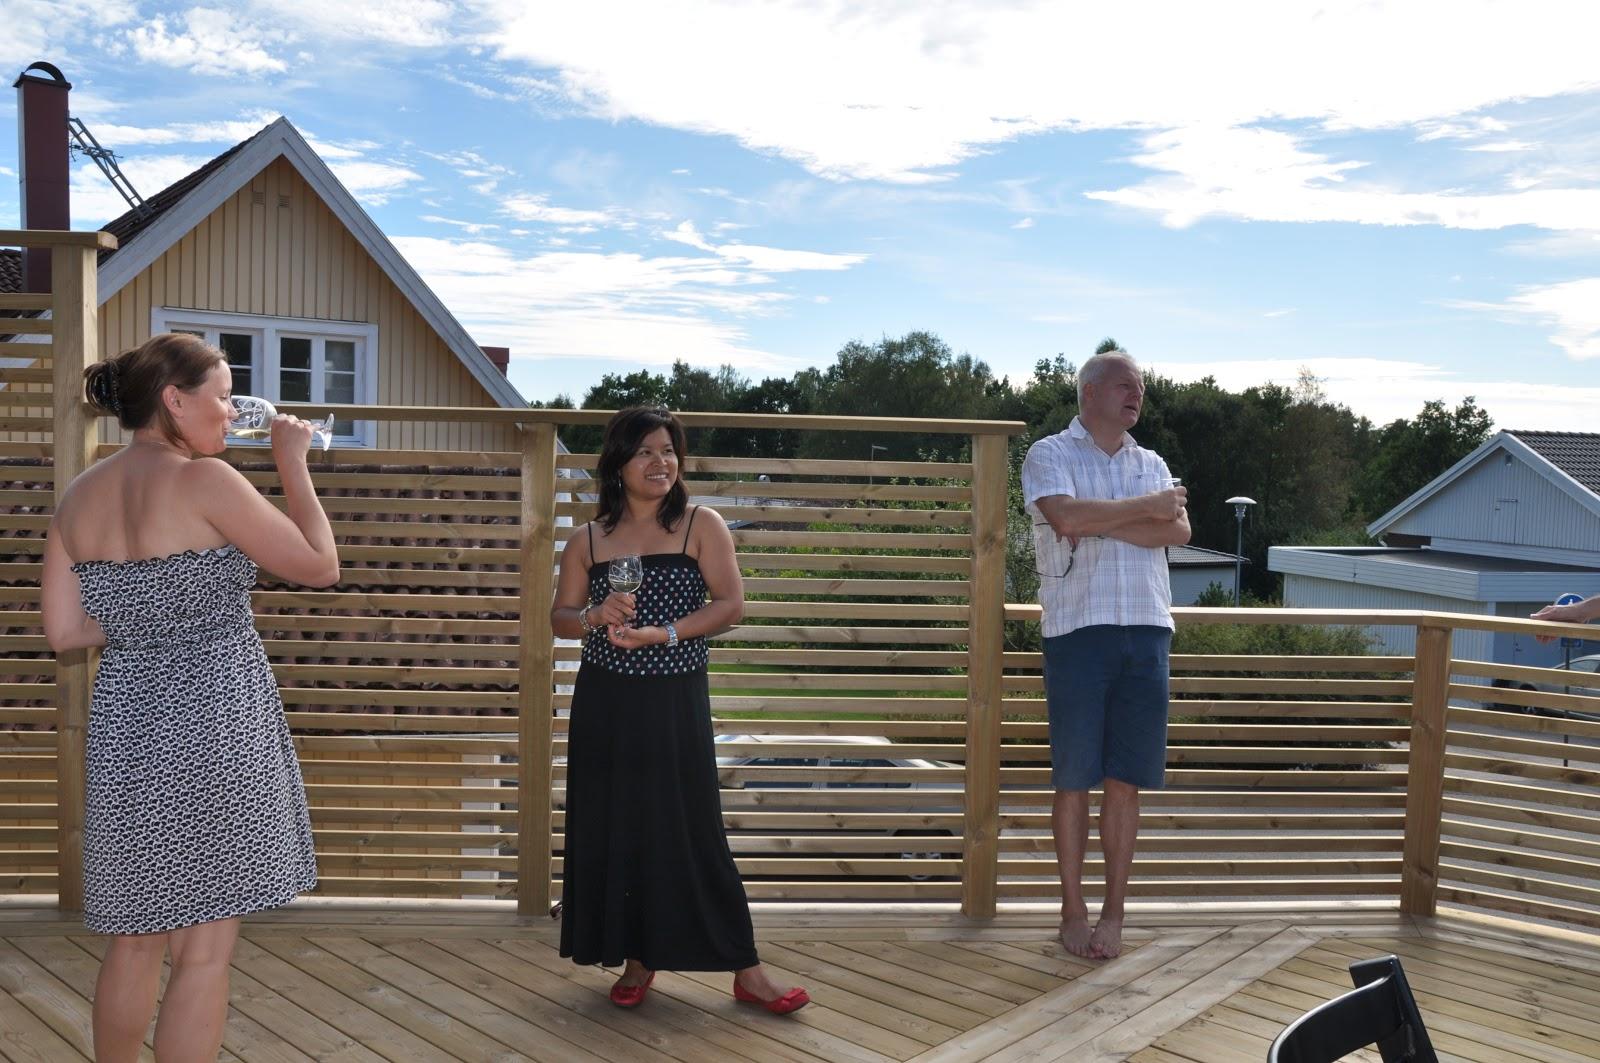 Fröken Ericas Hem & trädgård: oktober 2012